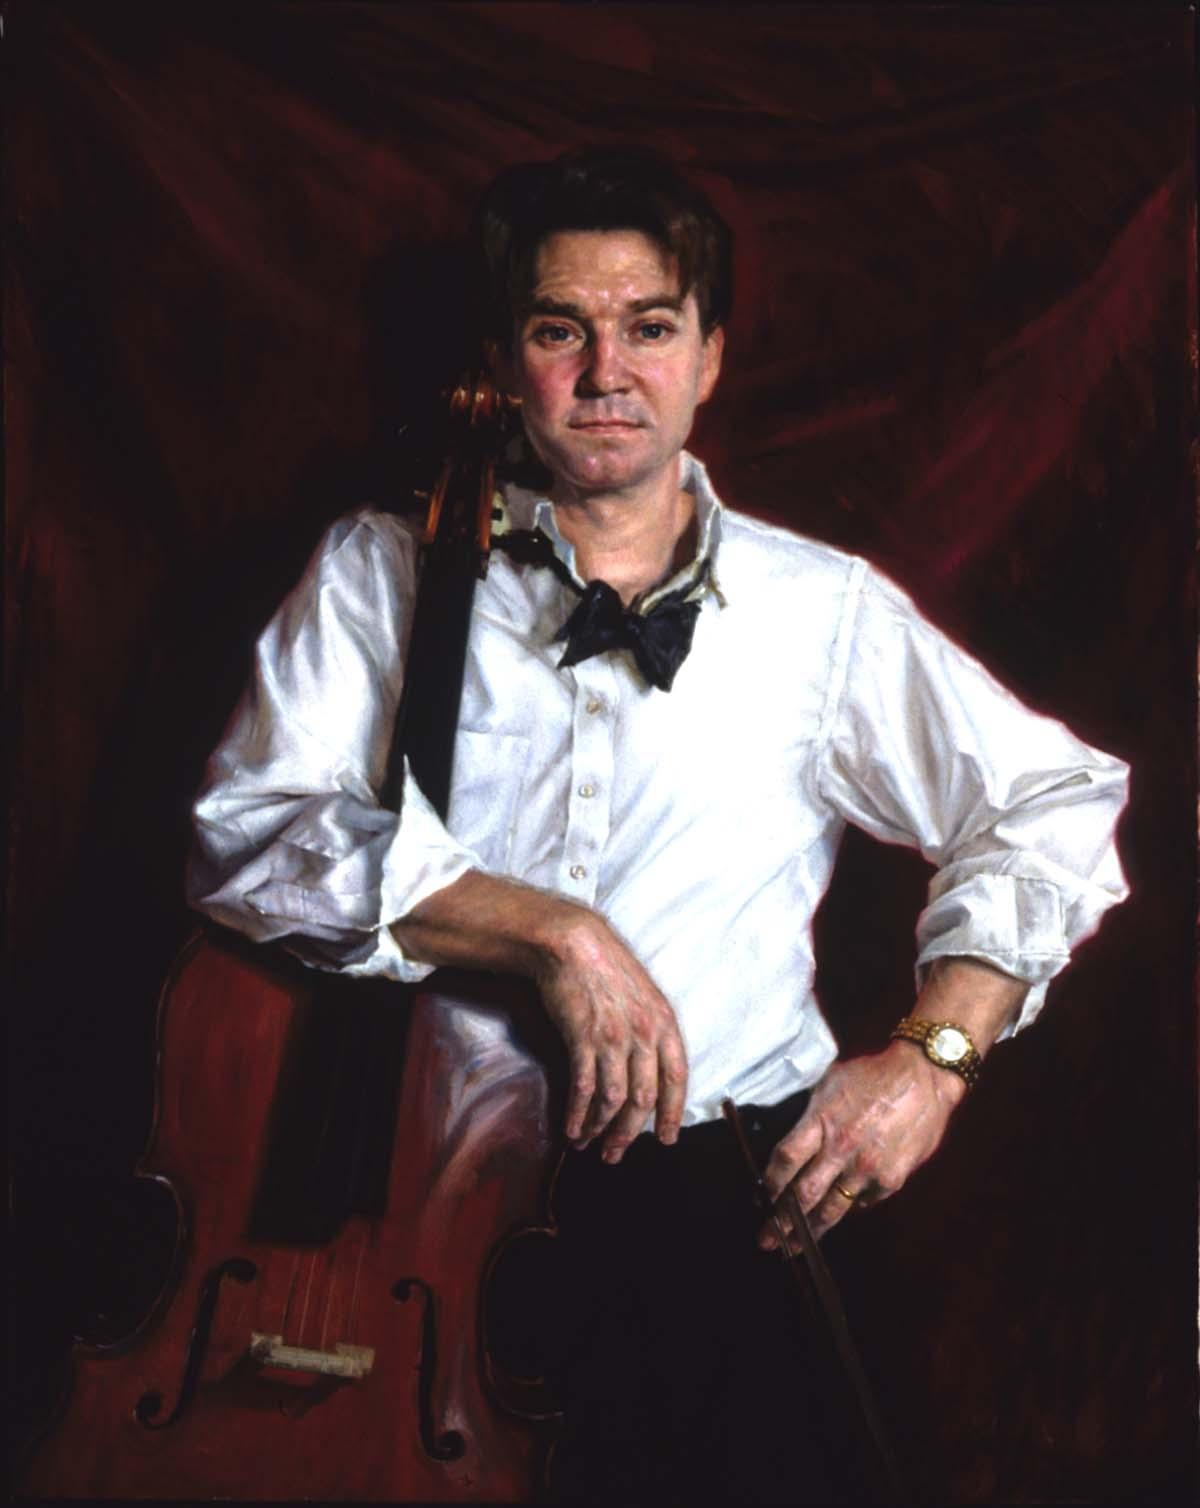 2003- Robert Liberace